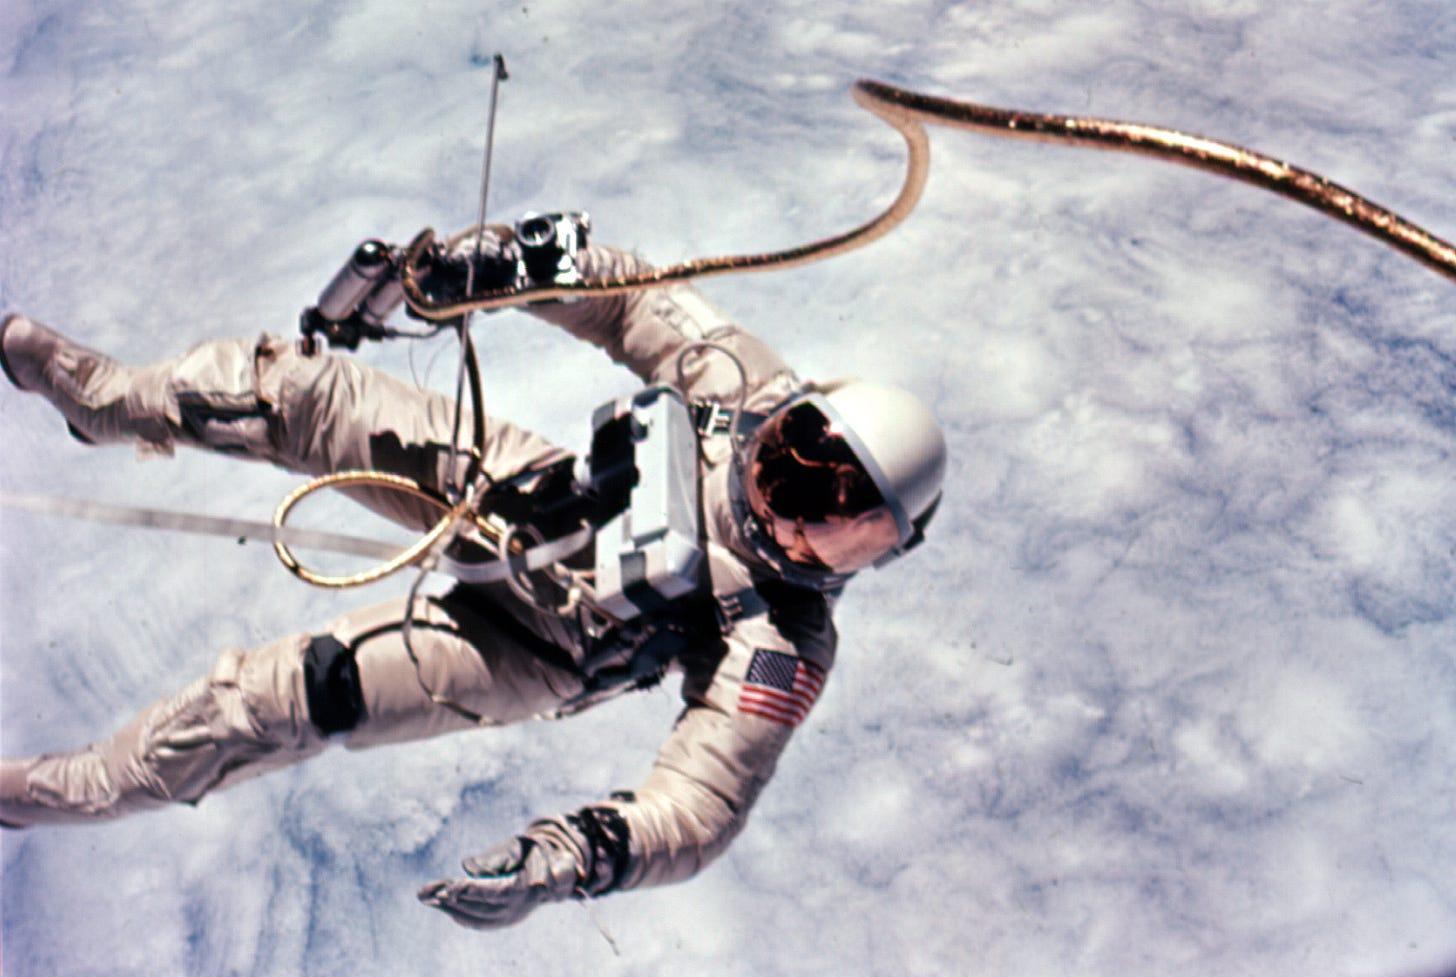 File:Astronaut Edward White first American spacewalk Gemini 4.jpg -  Wikimedia Commons